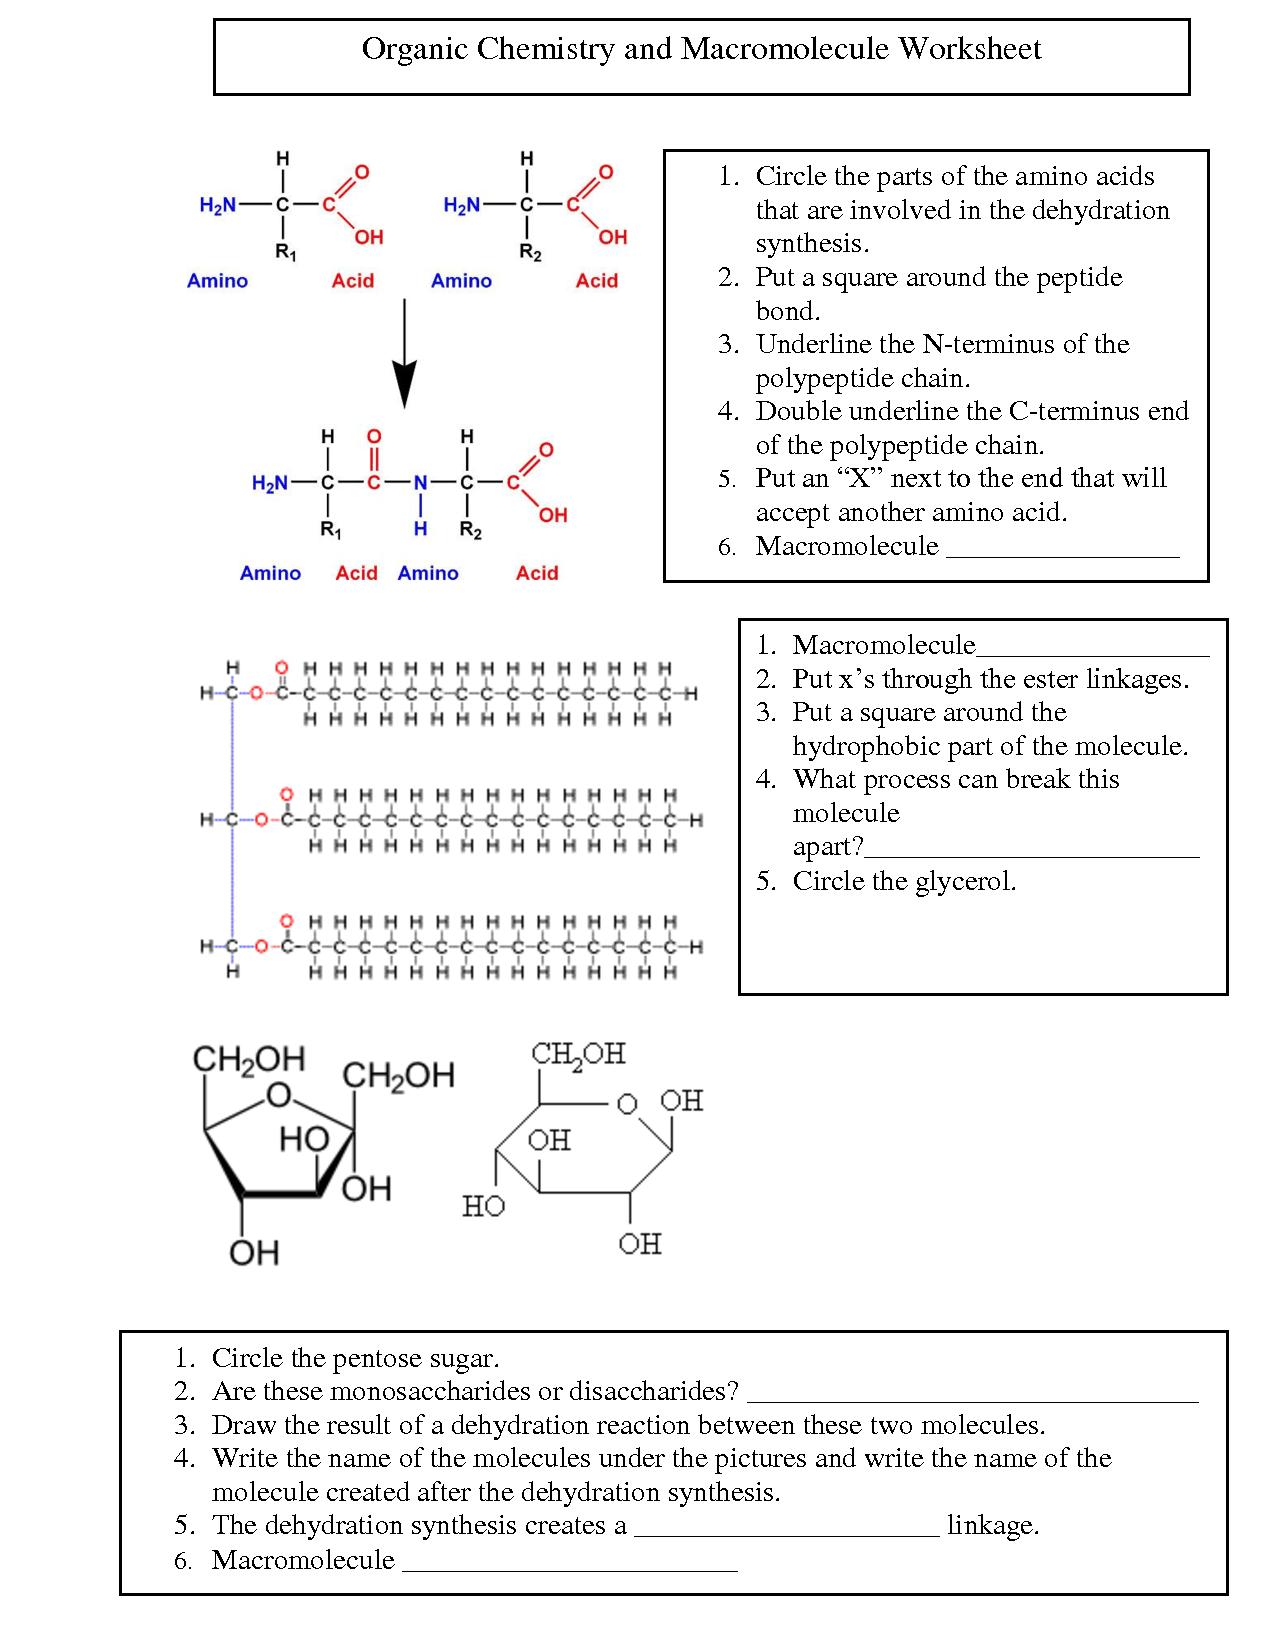 worksheet Organic Chemistry Worksheets organic chemistry worksheet free worksheets library download and g nic w ksheet 6 m cromolecules ksheet